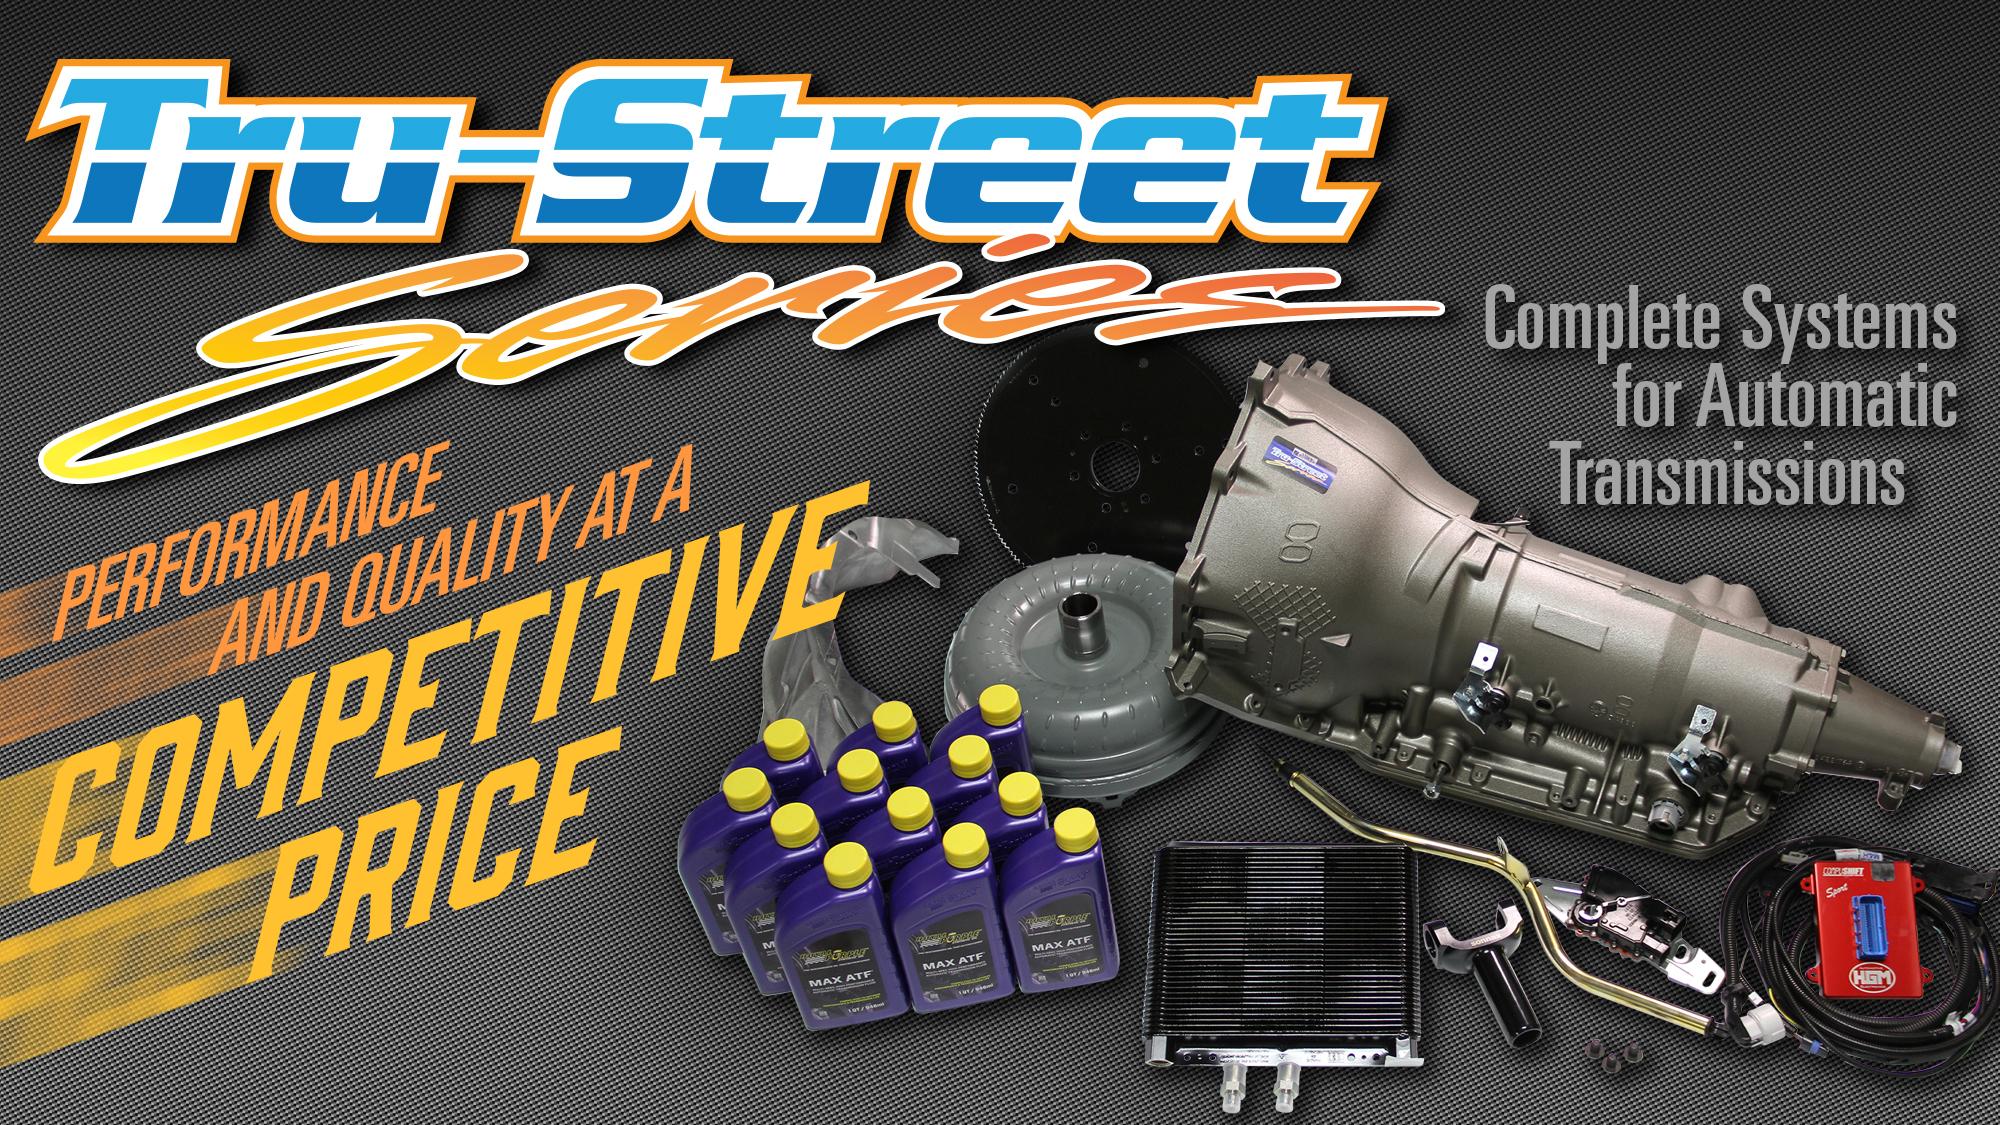 Tru street transmission package